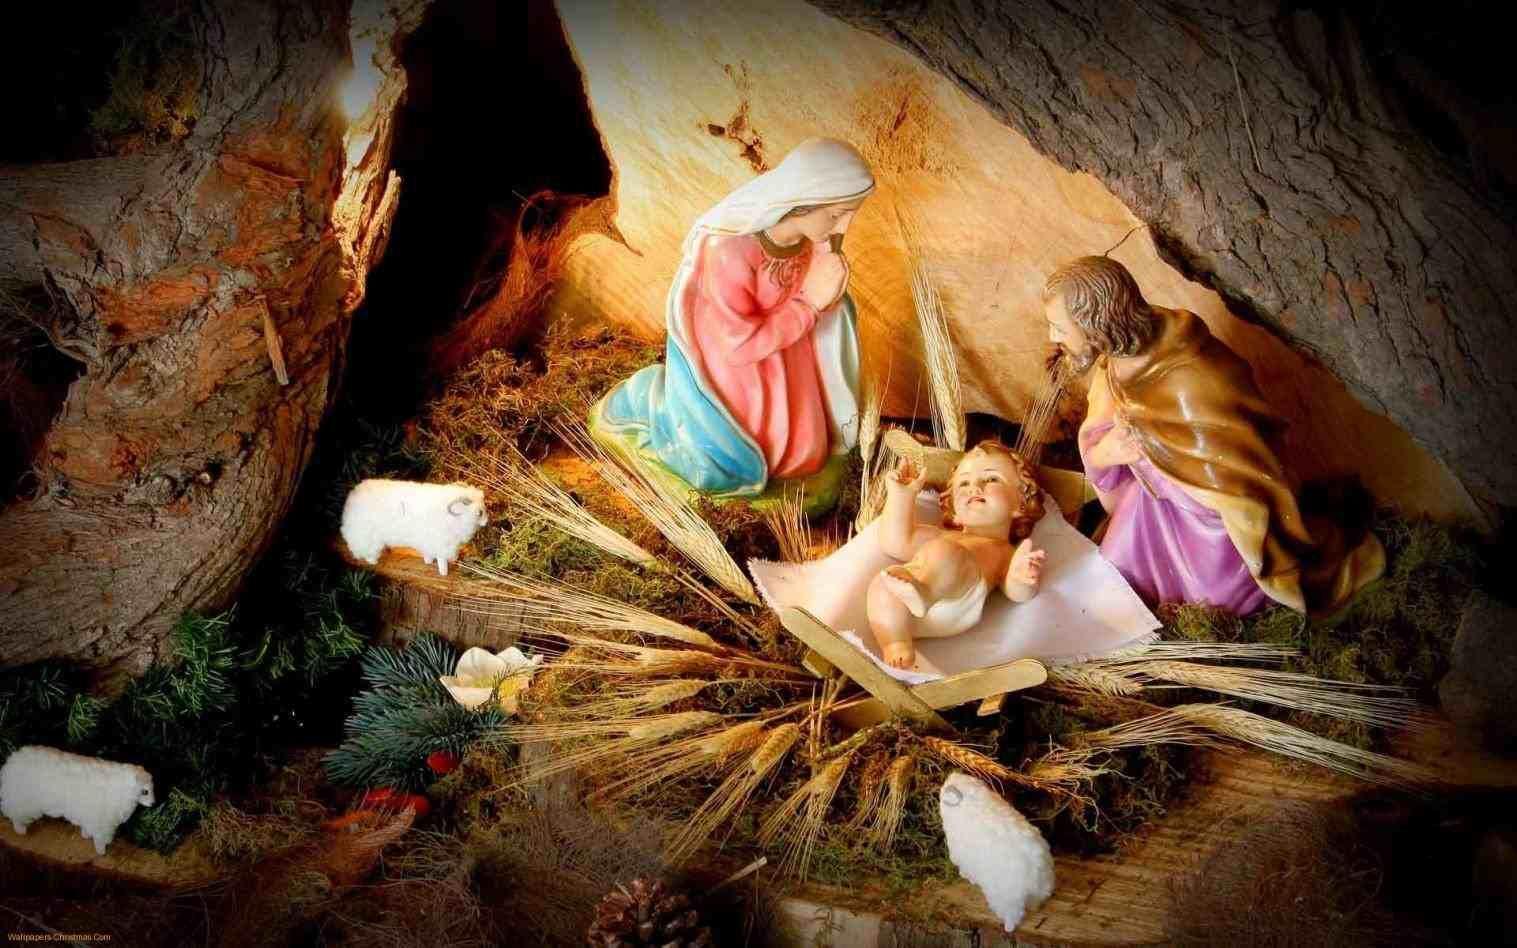 Merry Christmas Nativity Screensavers Christmas Nativity Scene Christmas Nativity Nativity Scene